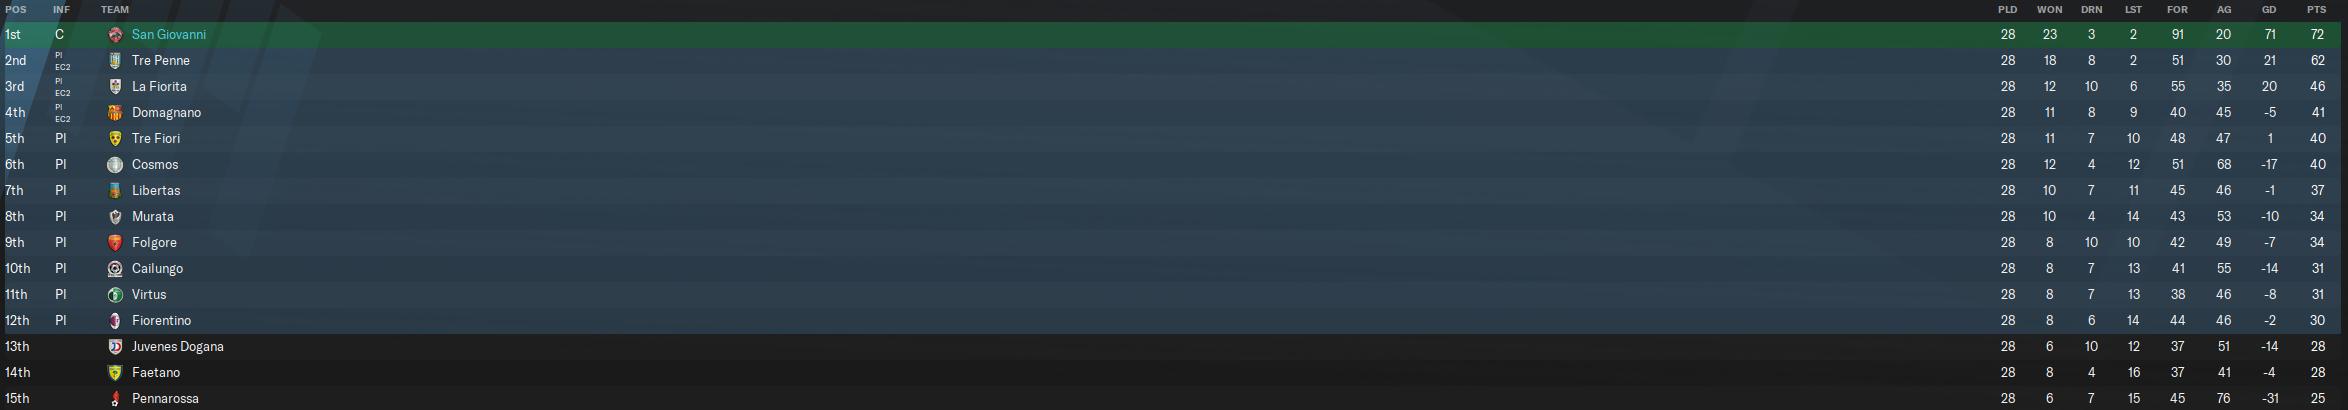 26-27 league table.PNG